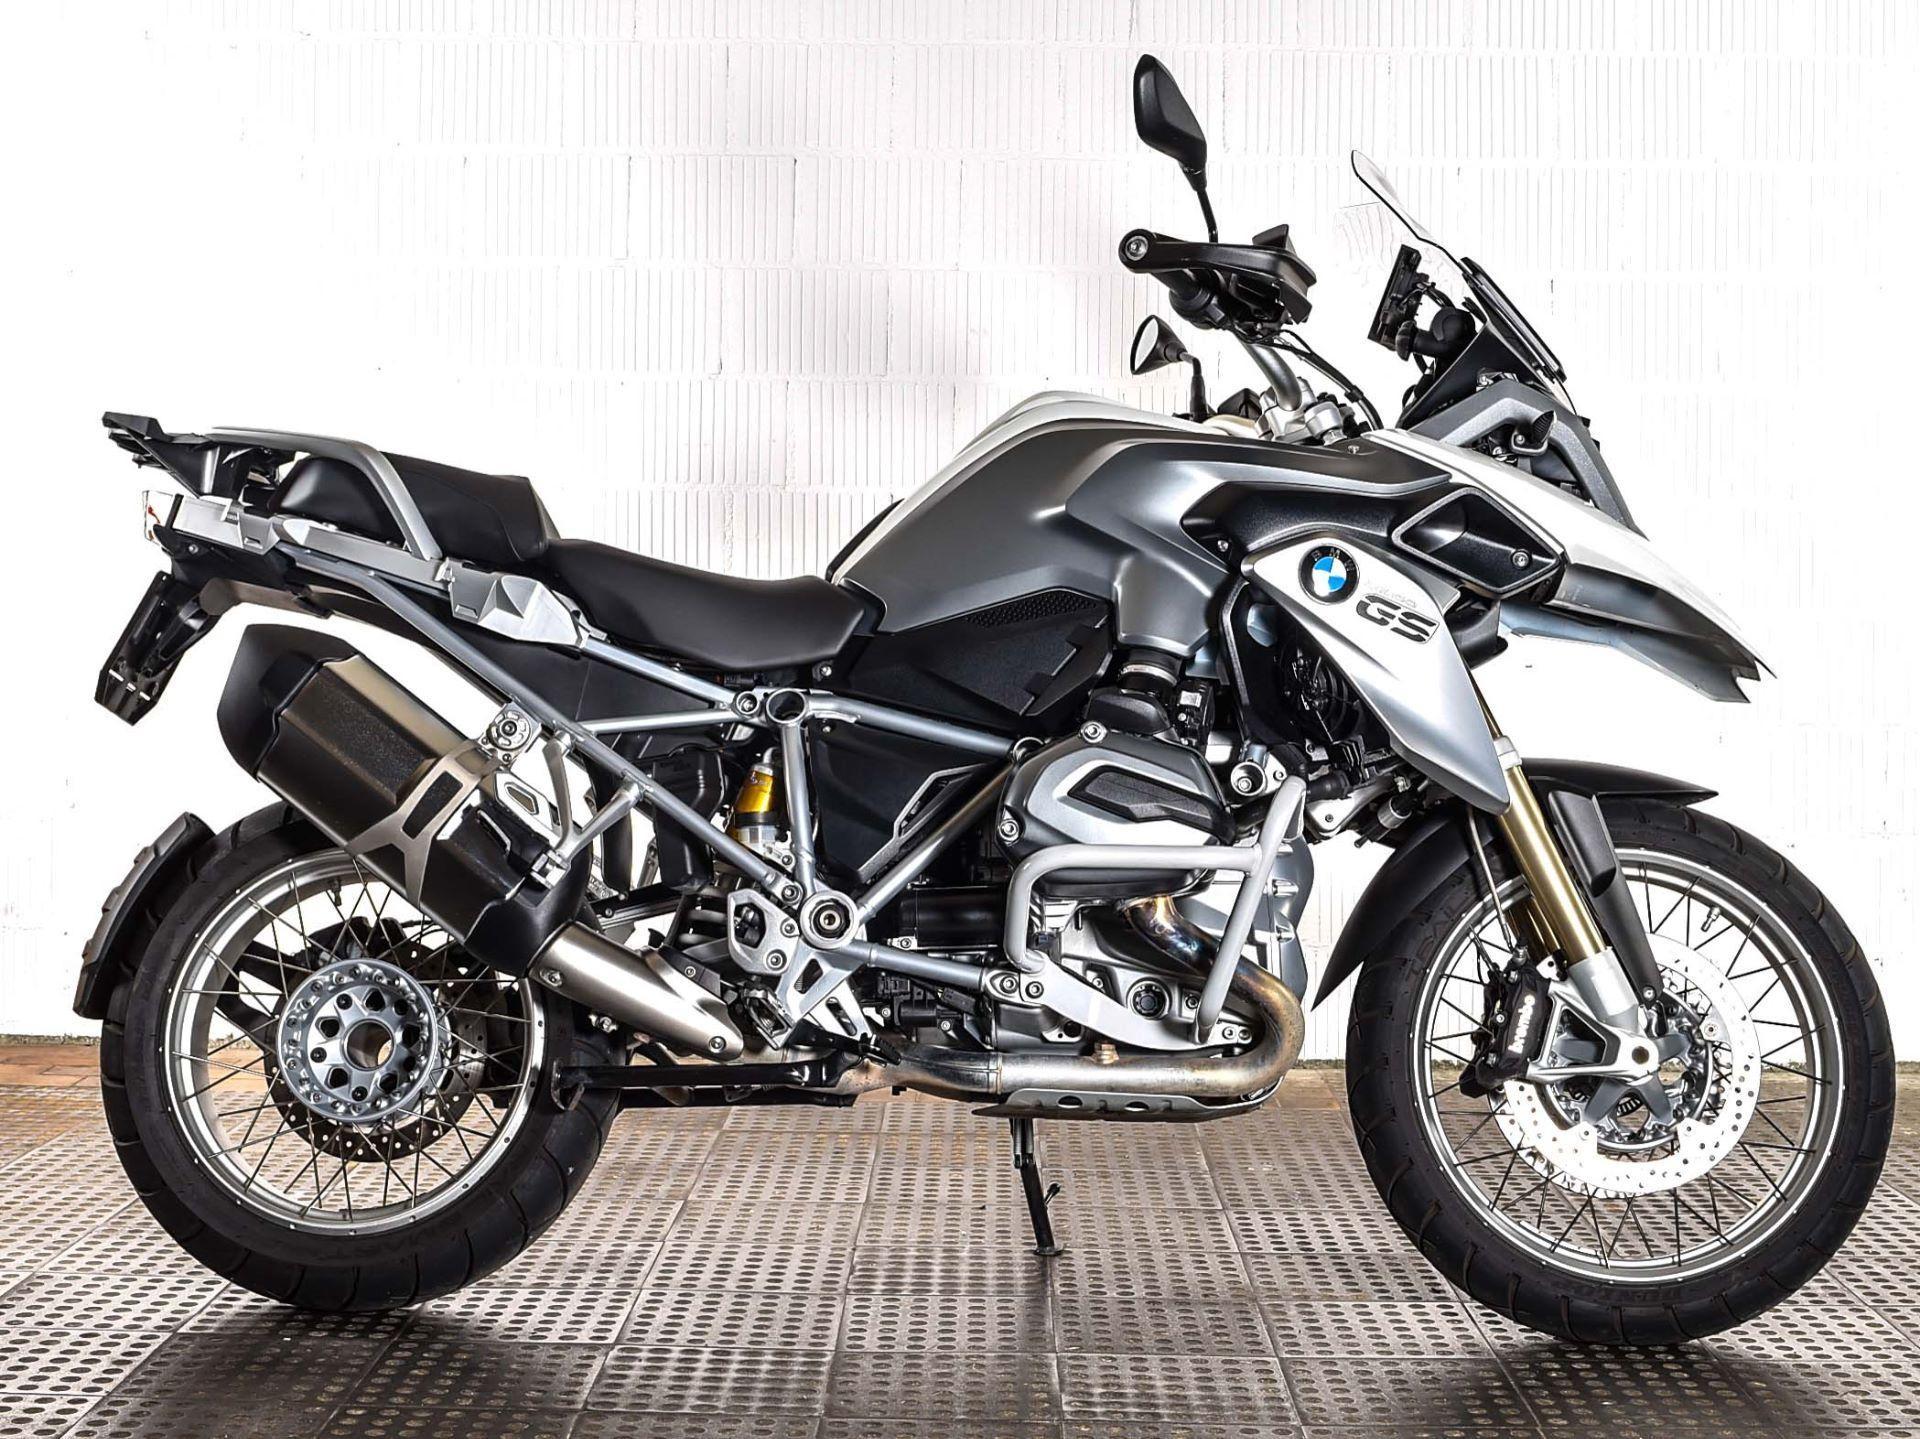 motorrad occasion kaufen bmw r 1200 gs abs motocenter seetal hochdorf. Black Bedroom Furniture Sets. Home Design Ideas